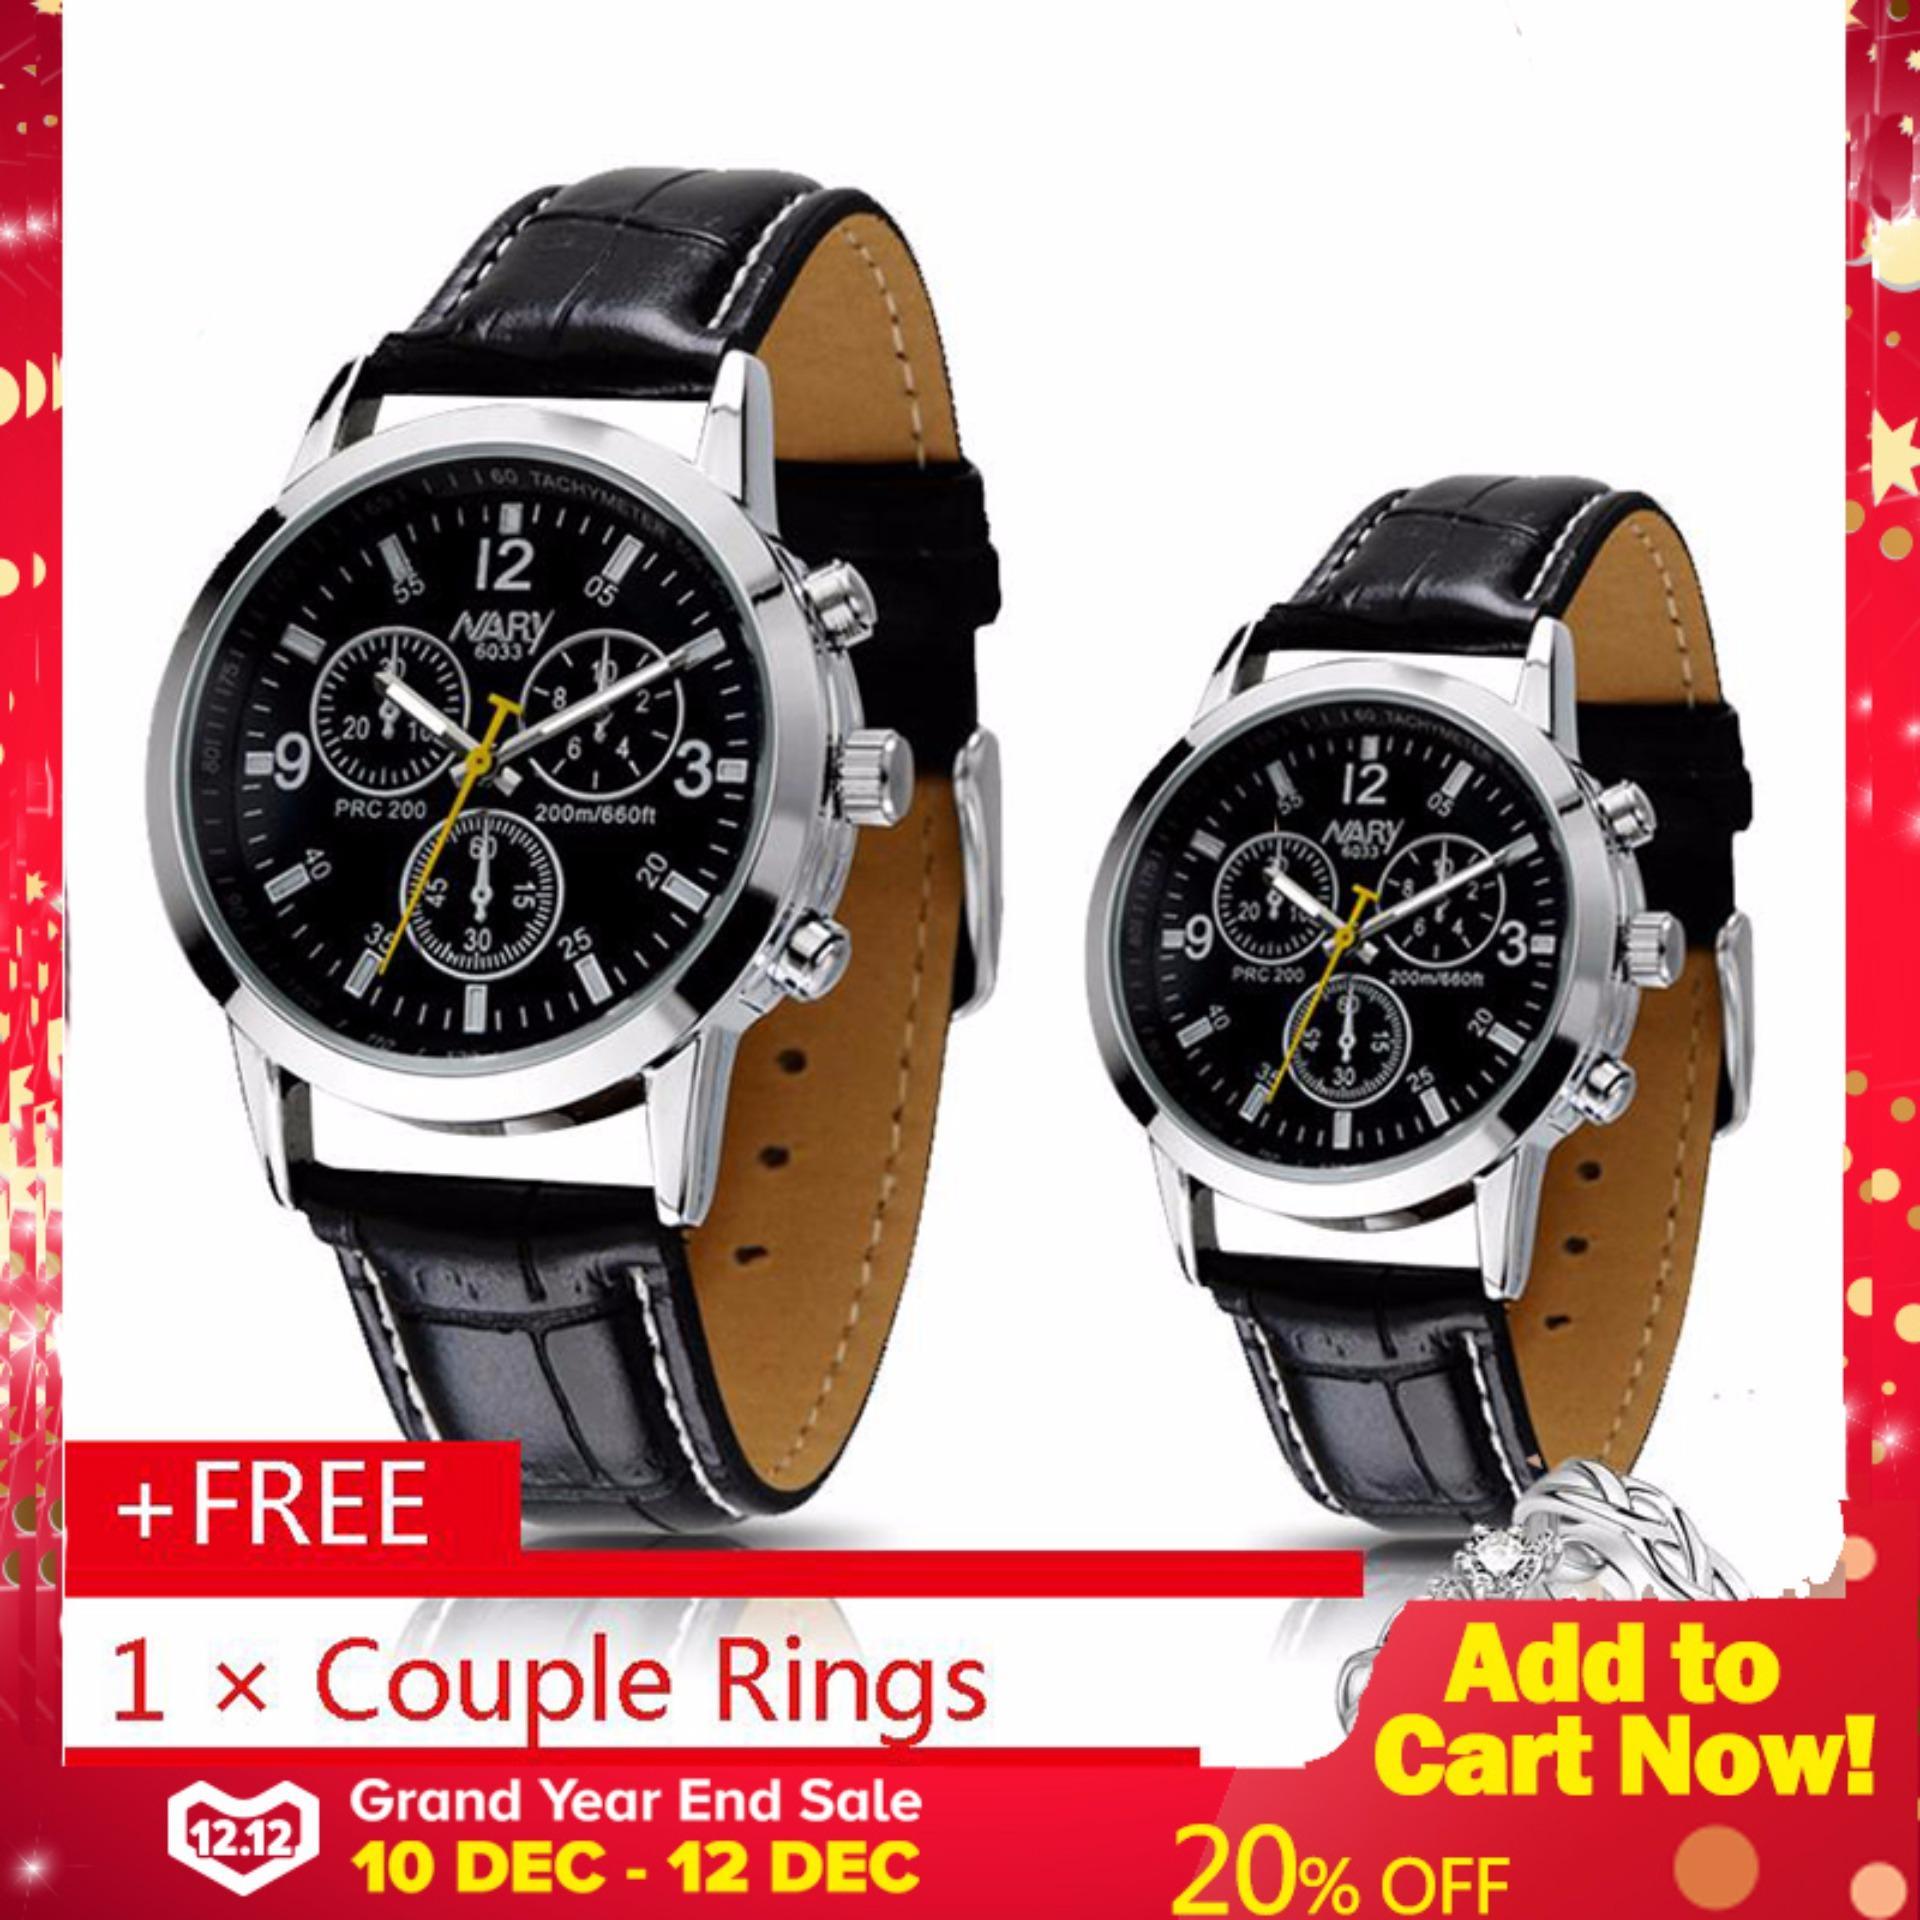 Watches For Women Sale Womens Online Brands Prices New Voltus Sport Mens Plait Nary 6033 2pcs Couple Watch Brand Men Luxury Quartz Calendars Leather Strap Casual Waterproof